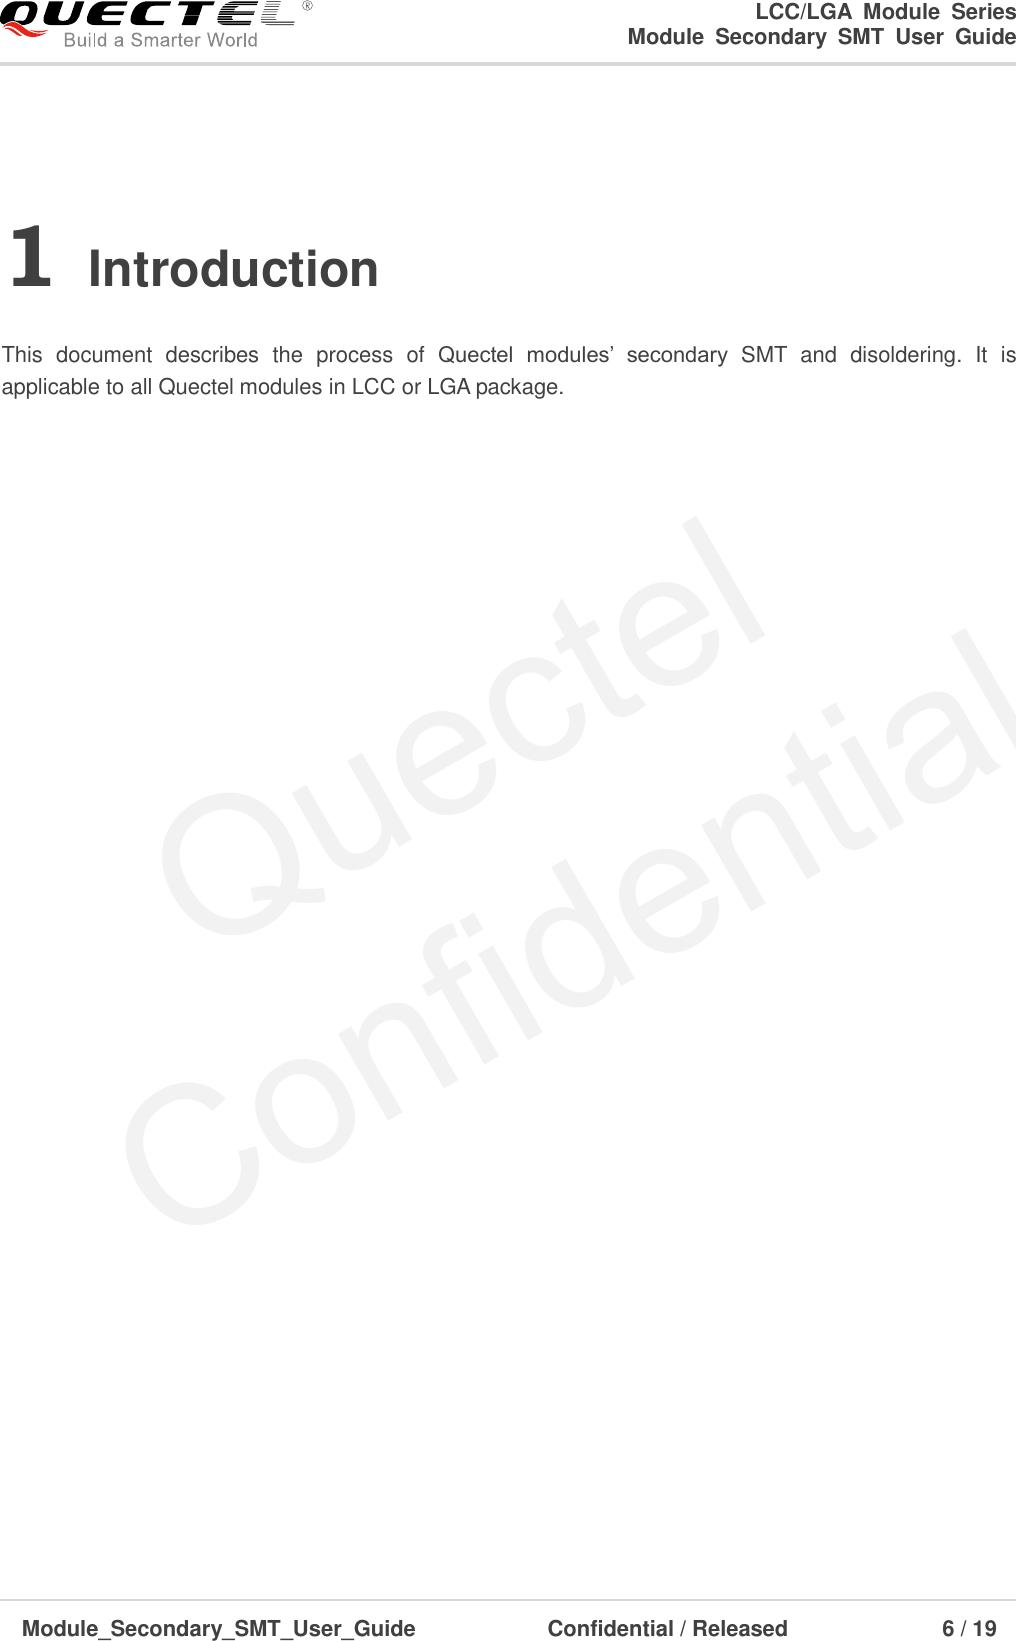 Quectel Module Secondary SMT User Guide V2 3